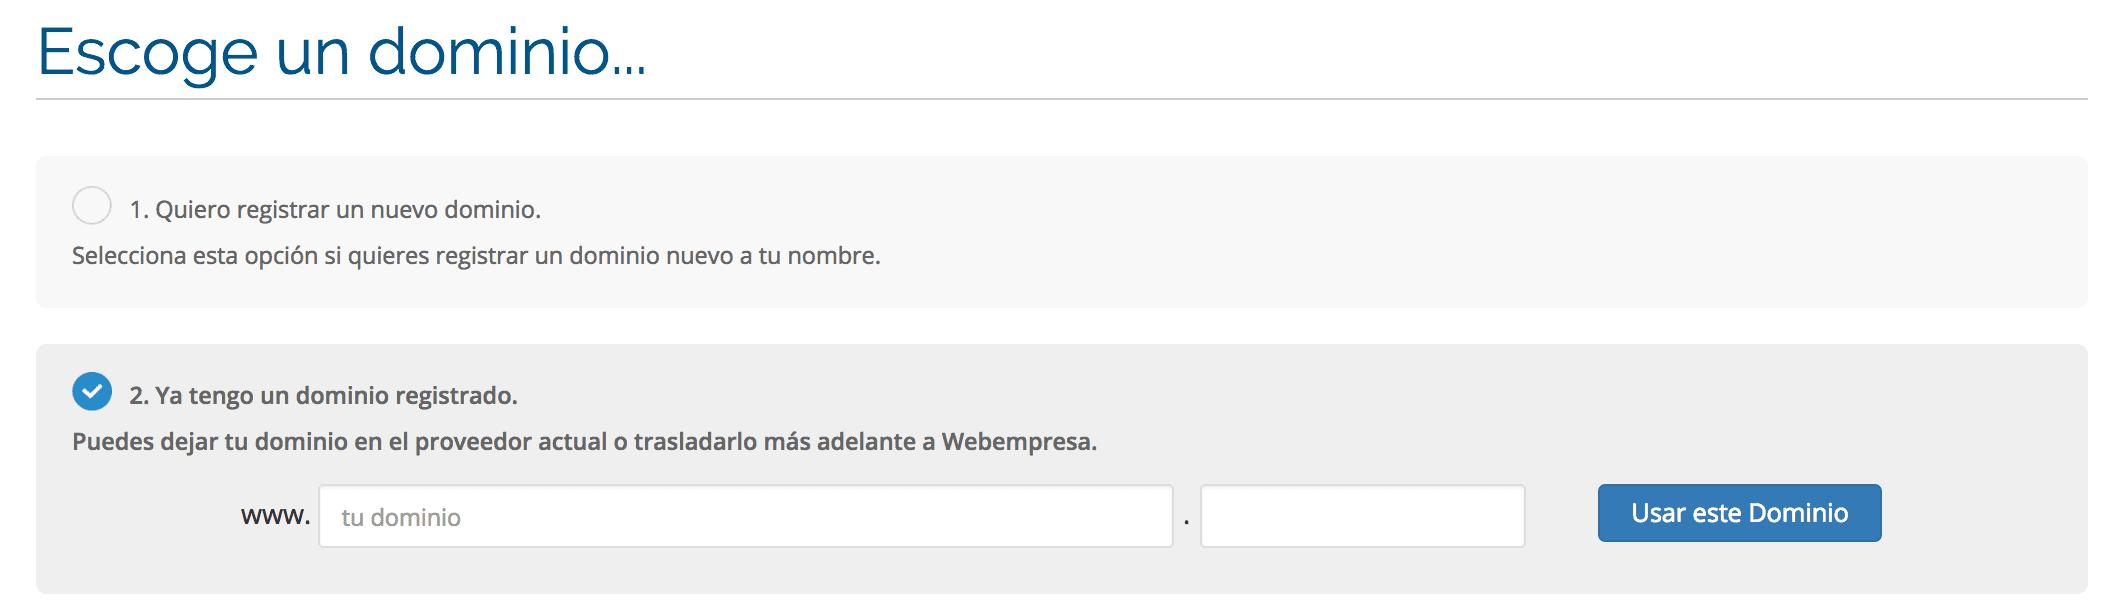 Alta webempresa